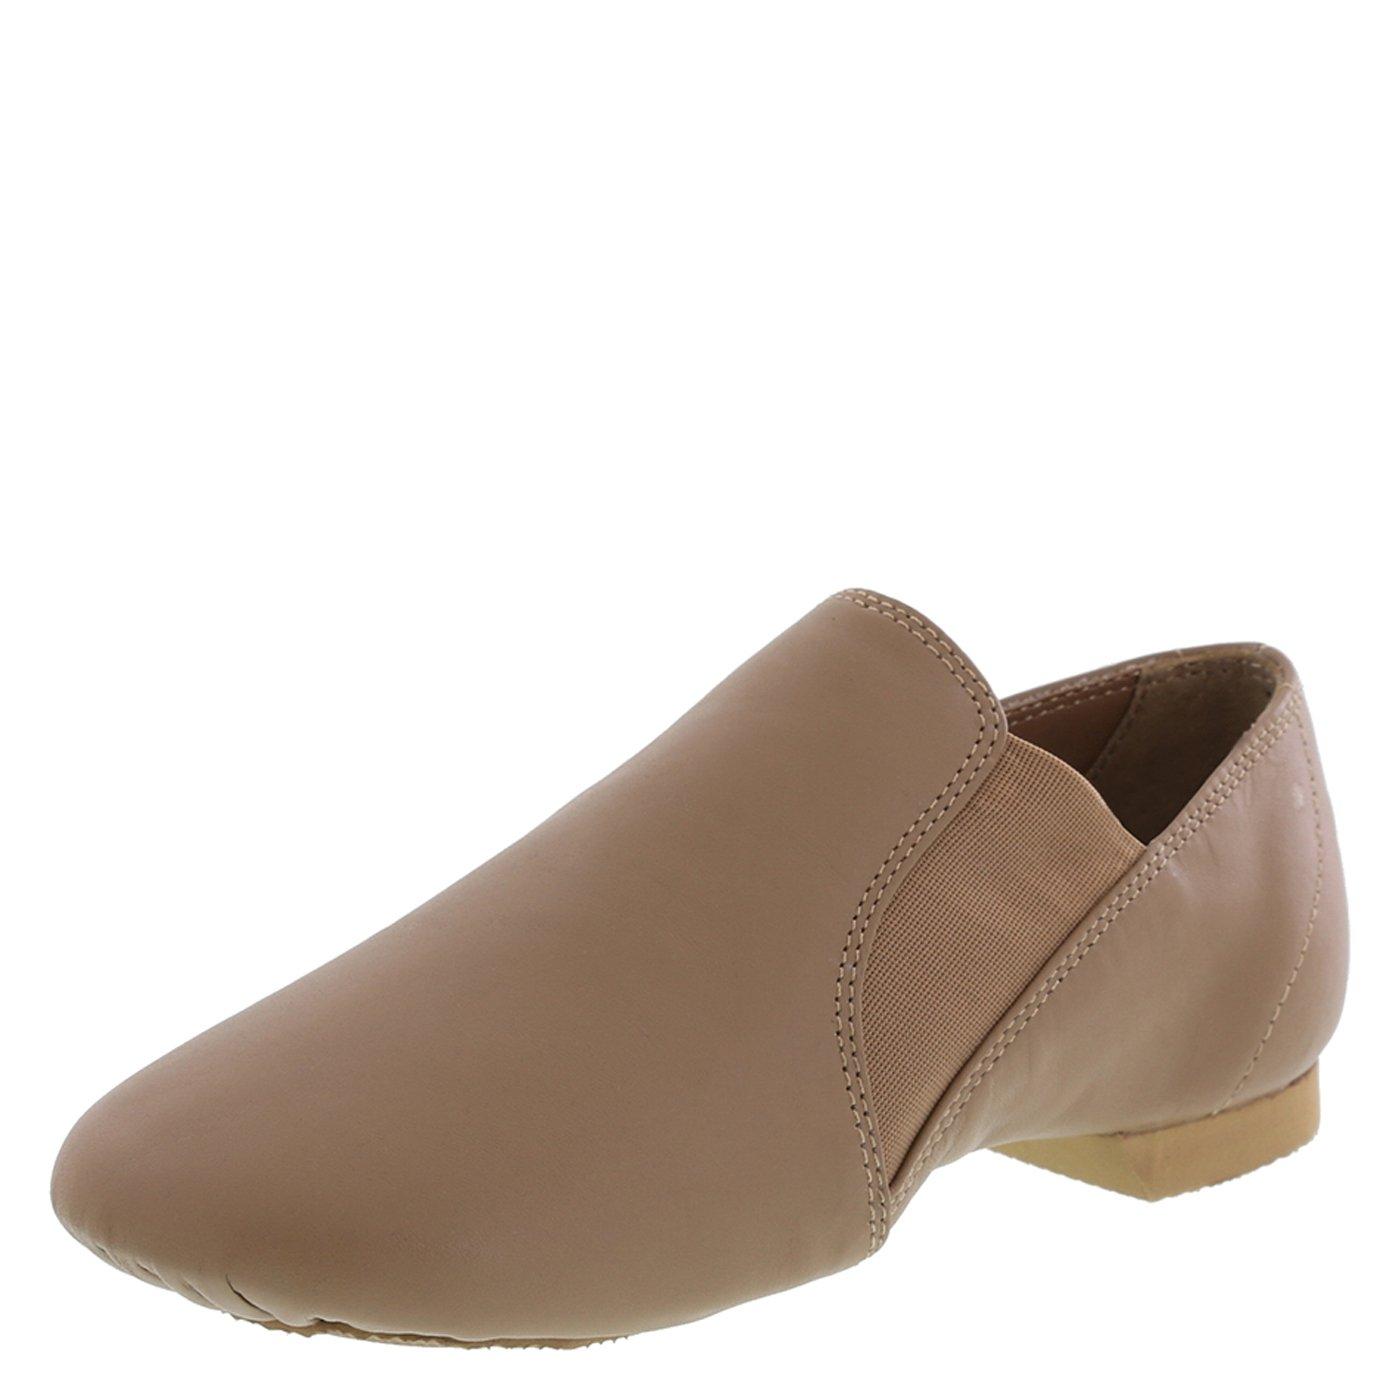 American Ballet Theatre for Spotlights Women's Tan Twin Gore Jazz Shoe 7 M US